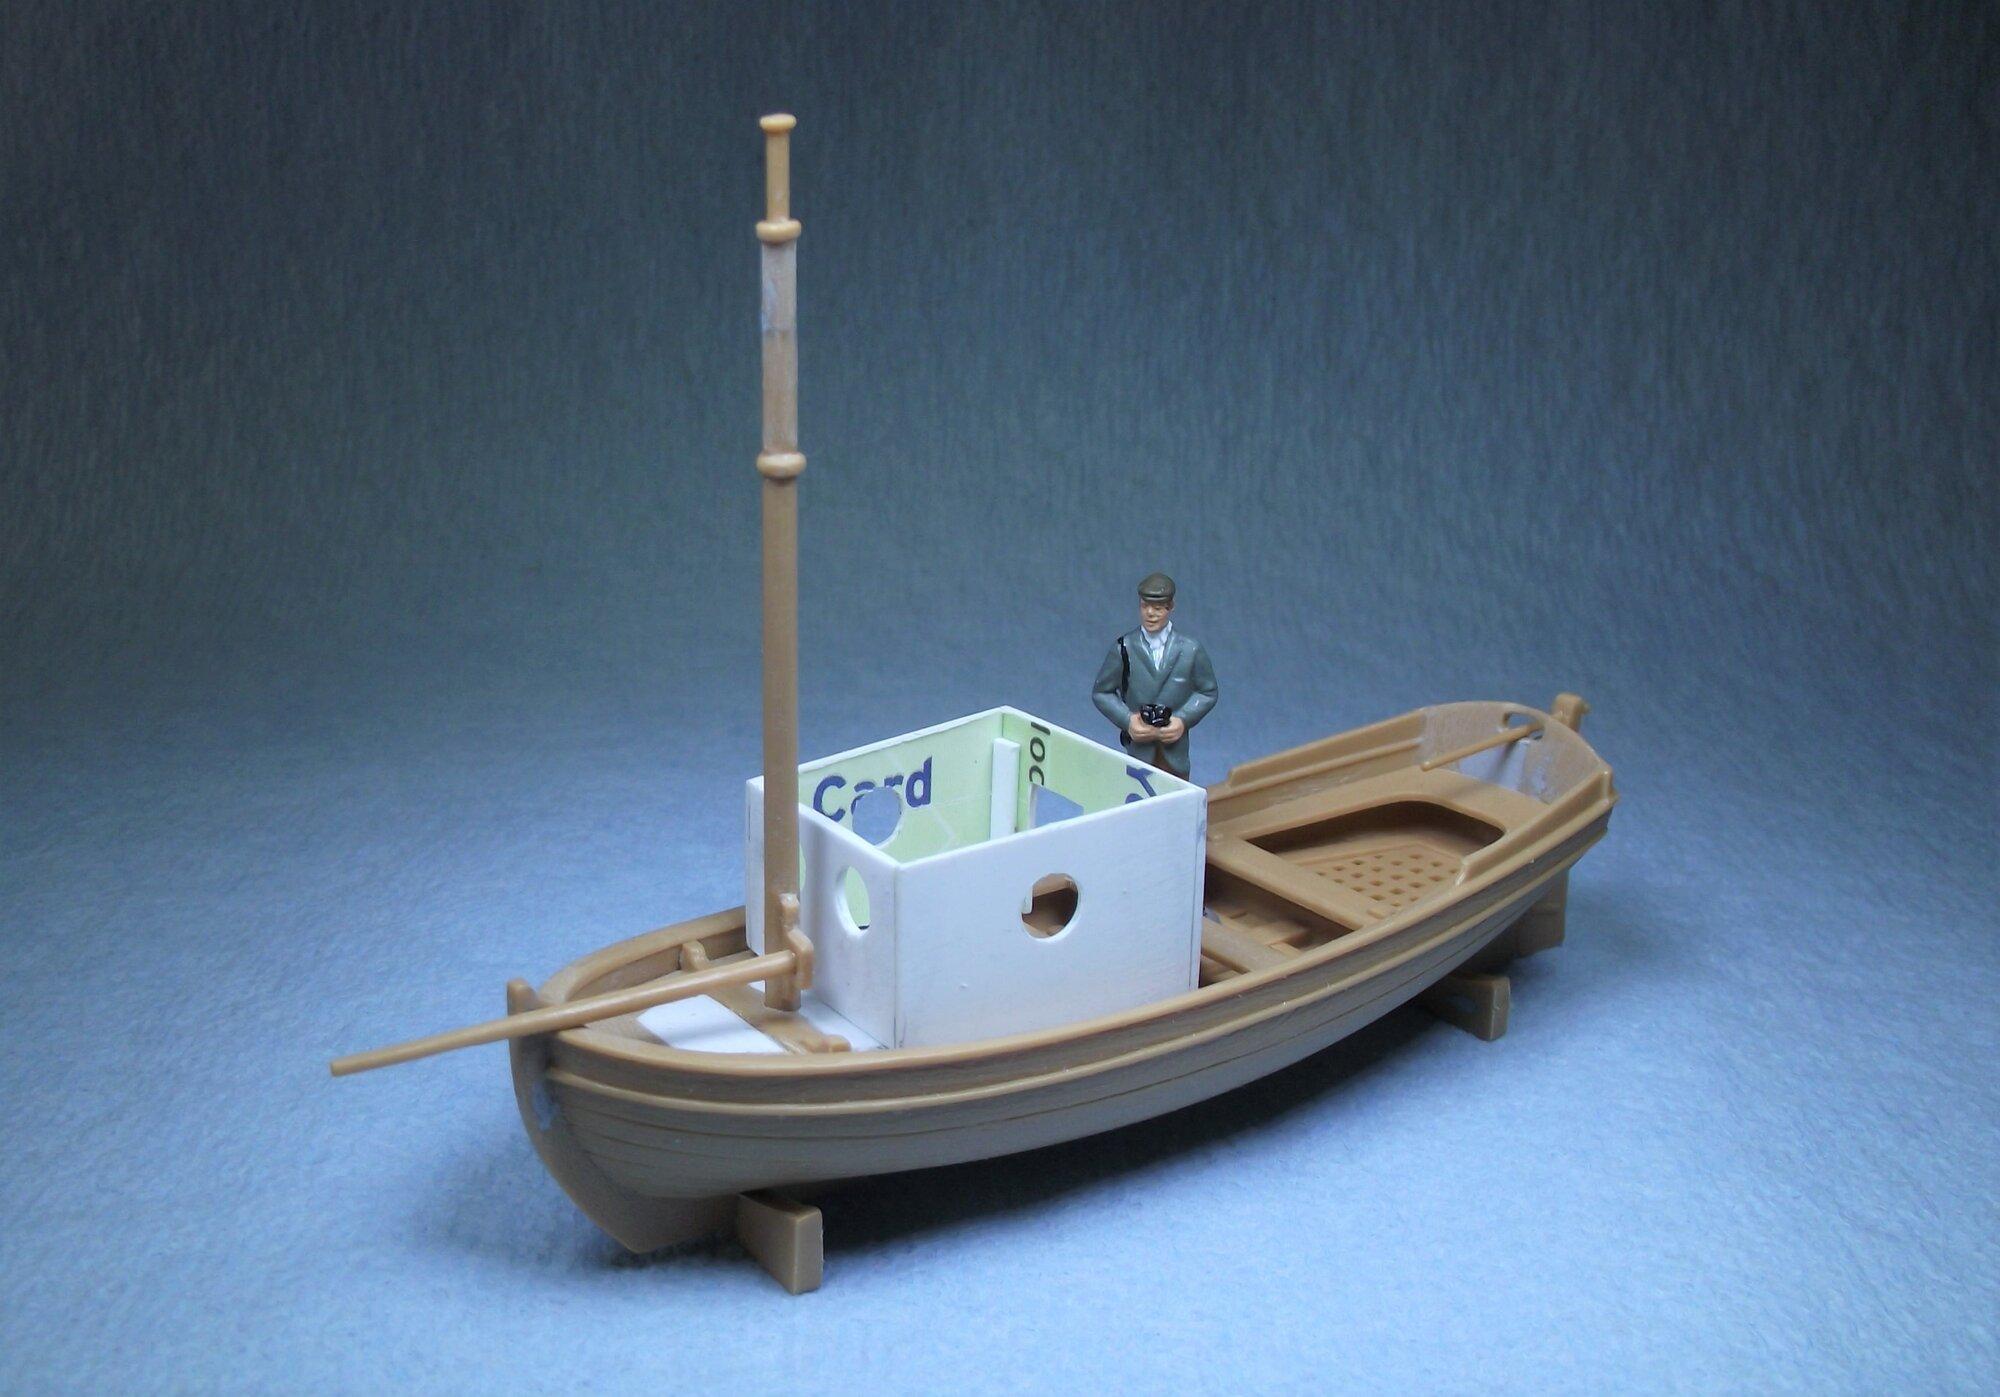 Boat_04-27-2021 (2).jpg